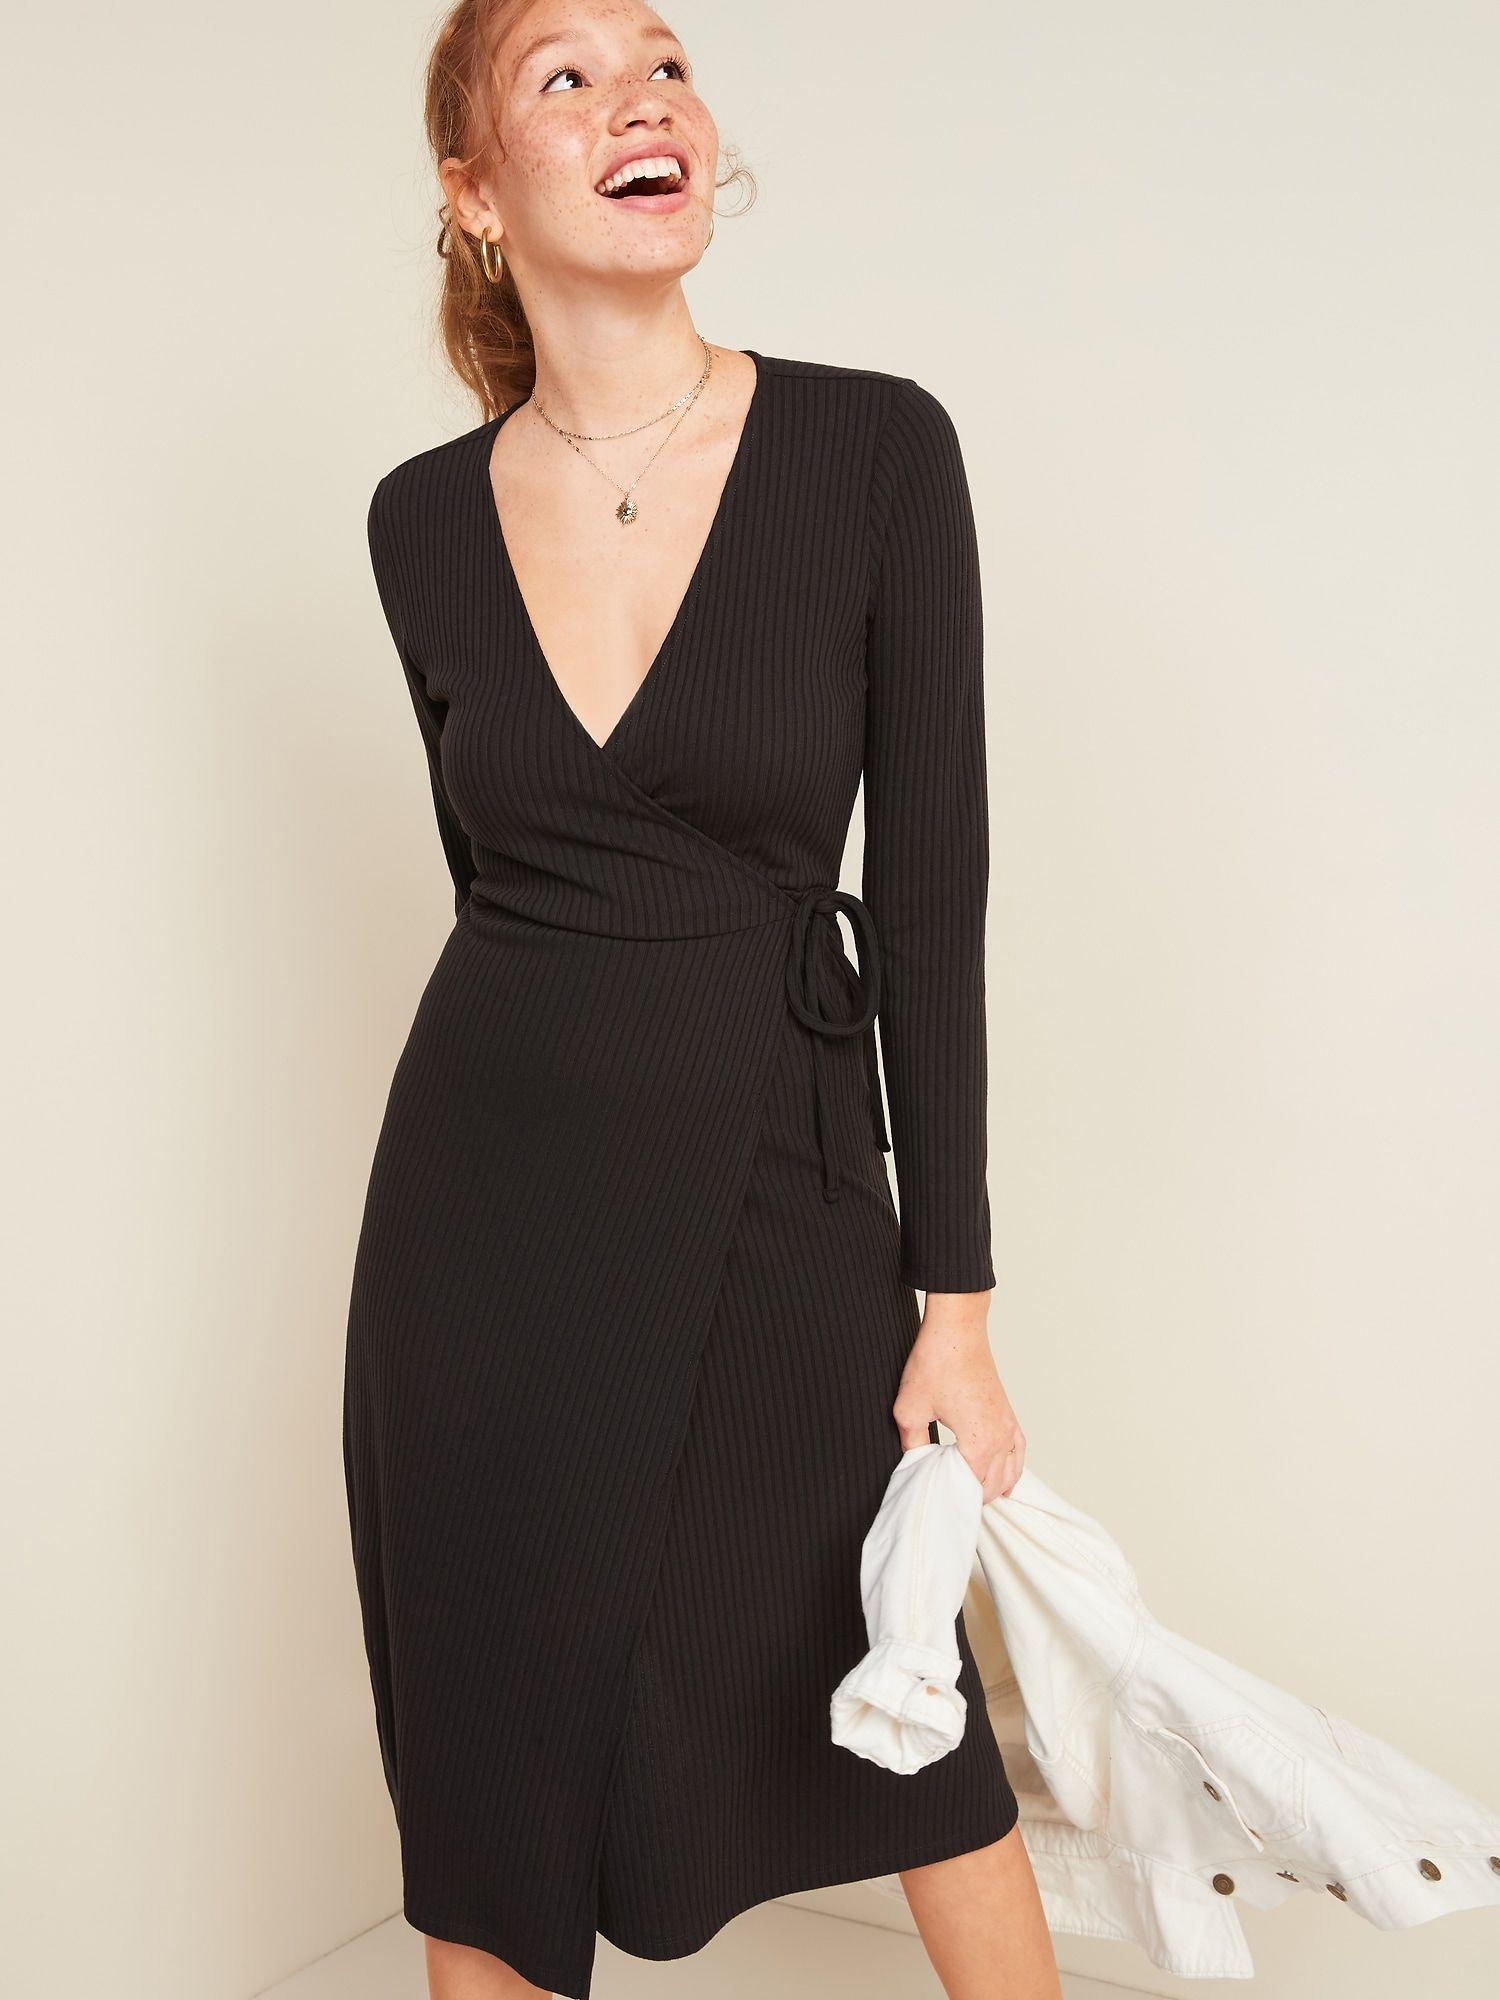 Rib Knit V Neck Midi Wrap Dress For Women Old Navy V Neck Black Dress Spring Dresses Casual Navy Wrap Dress [ 2000 x 1500 Pixel ]